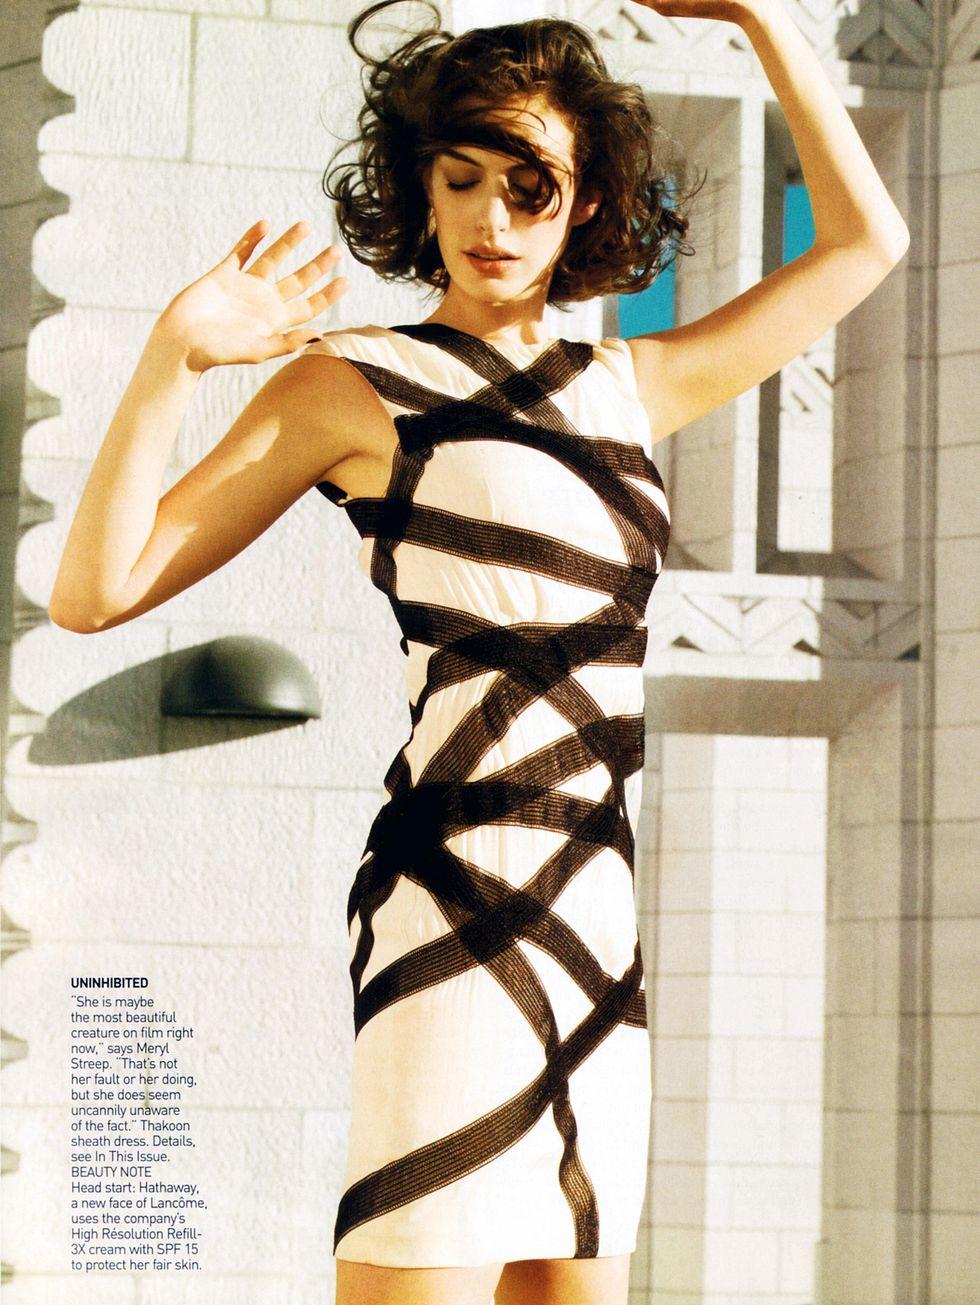 anne-hathaway-vogue-magazine-january-2009-01